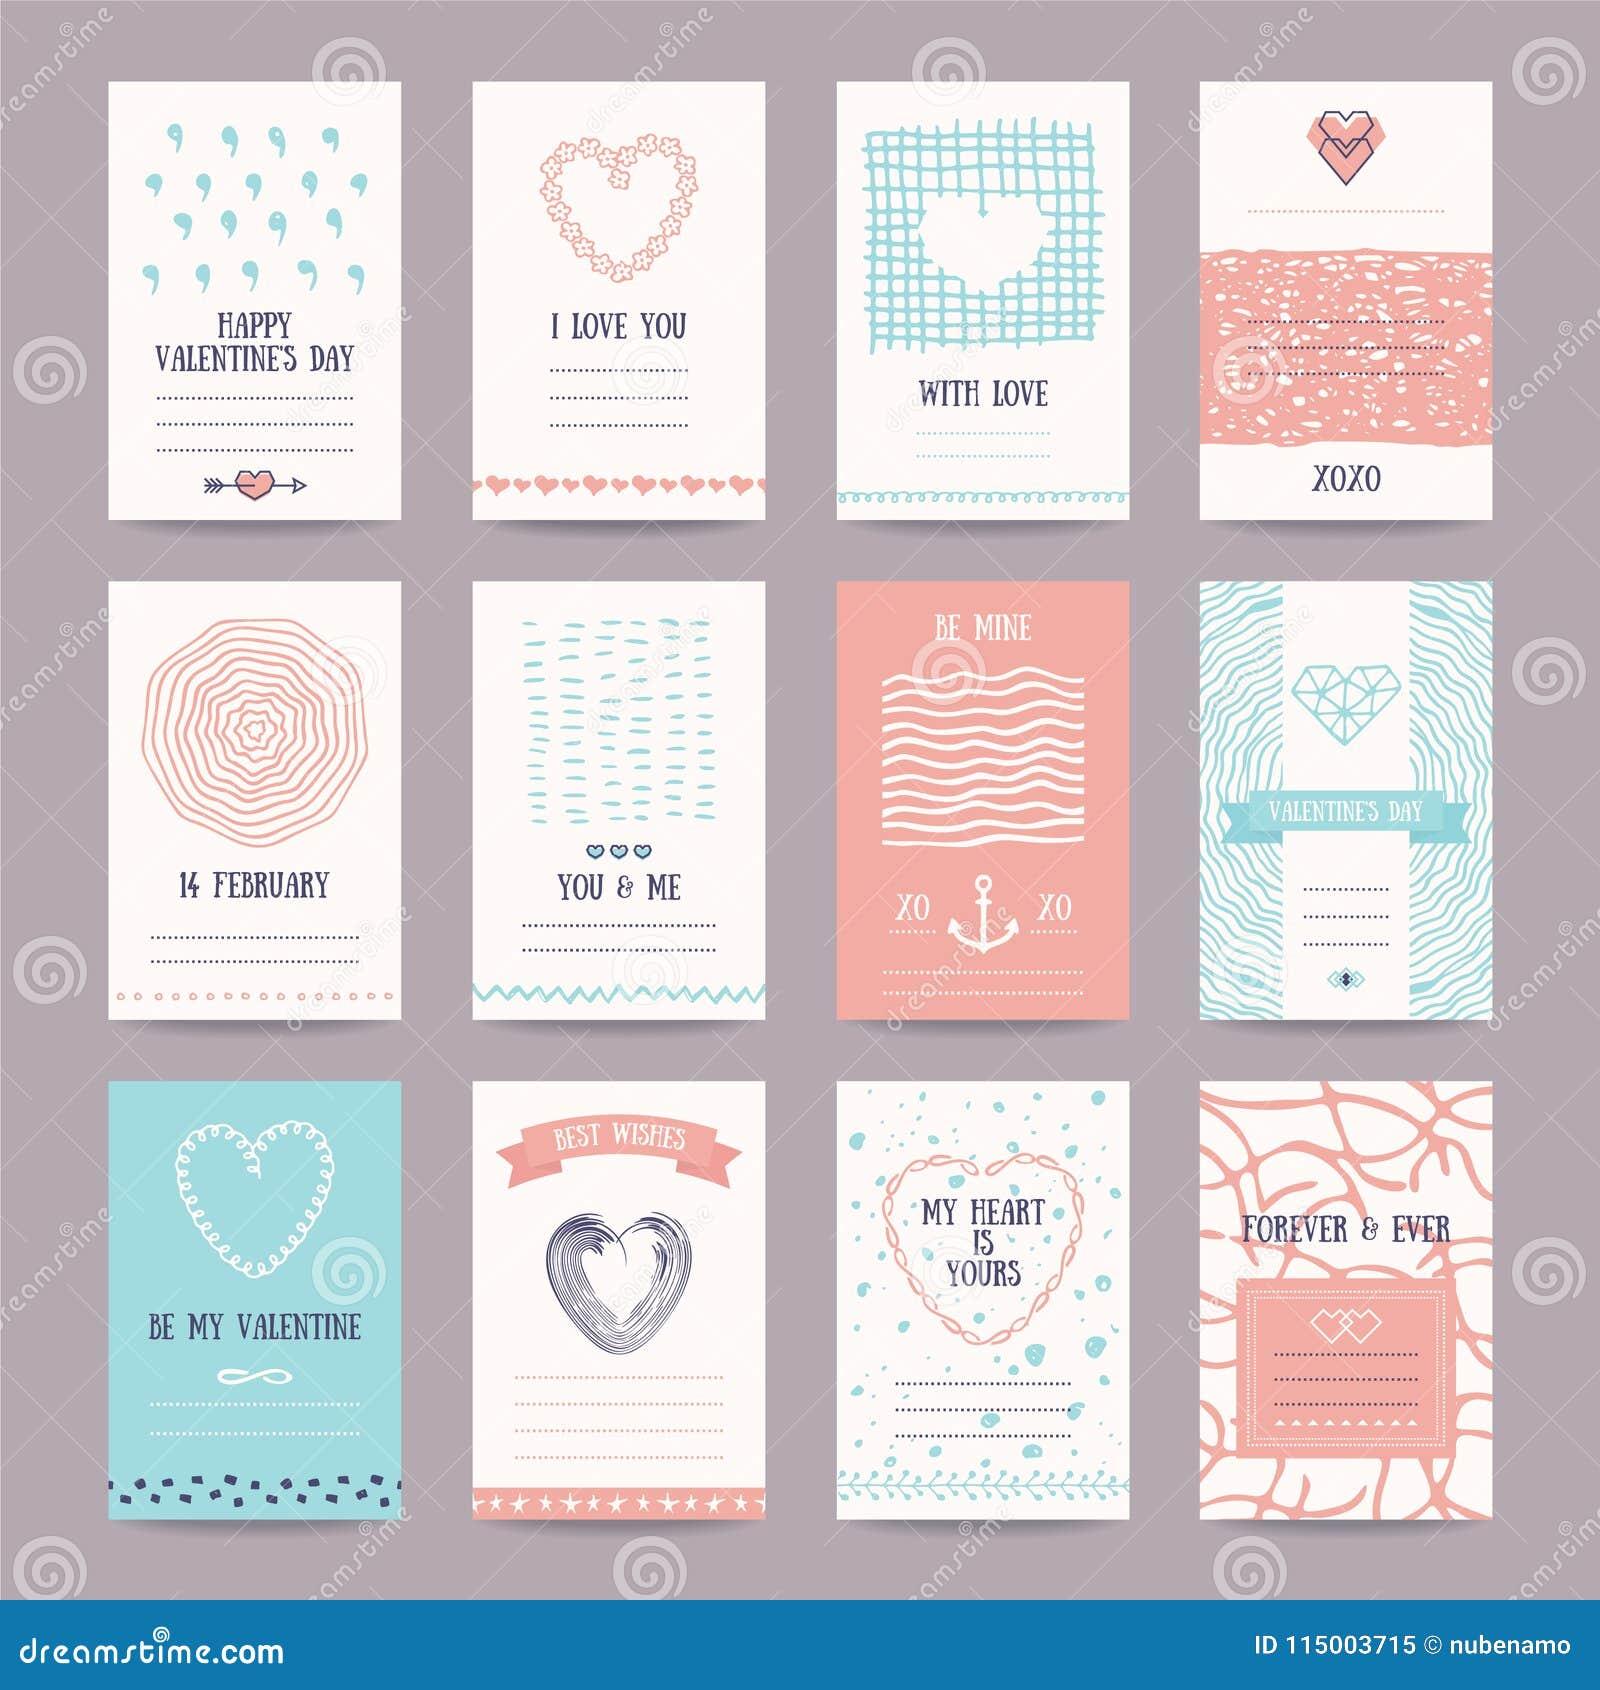 Romantic Card, Wedding Invitation Design Templates Stock Vector ...